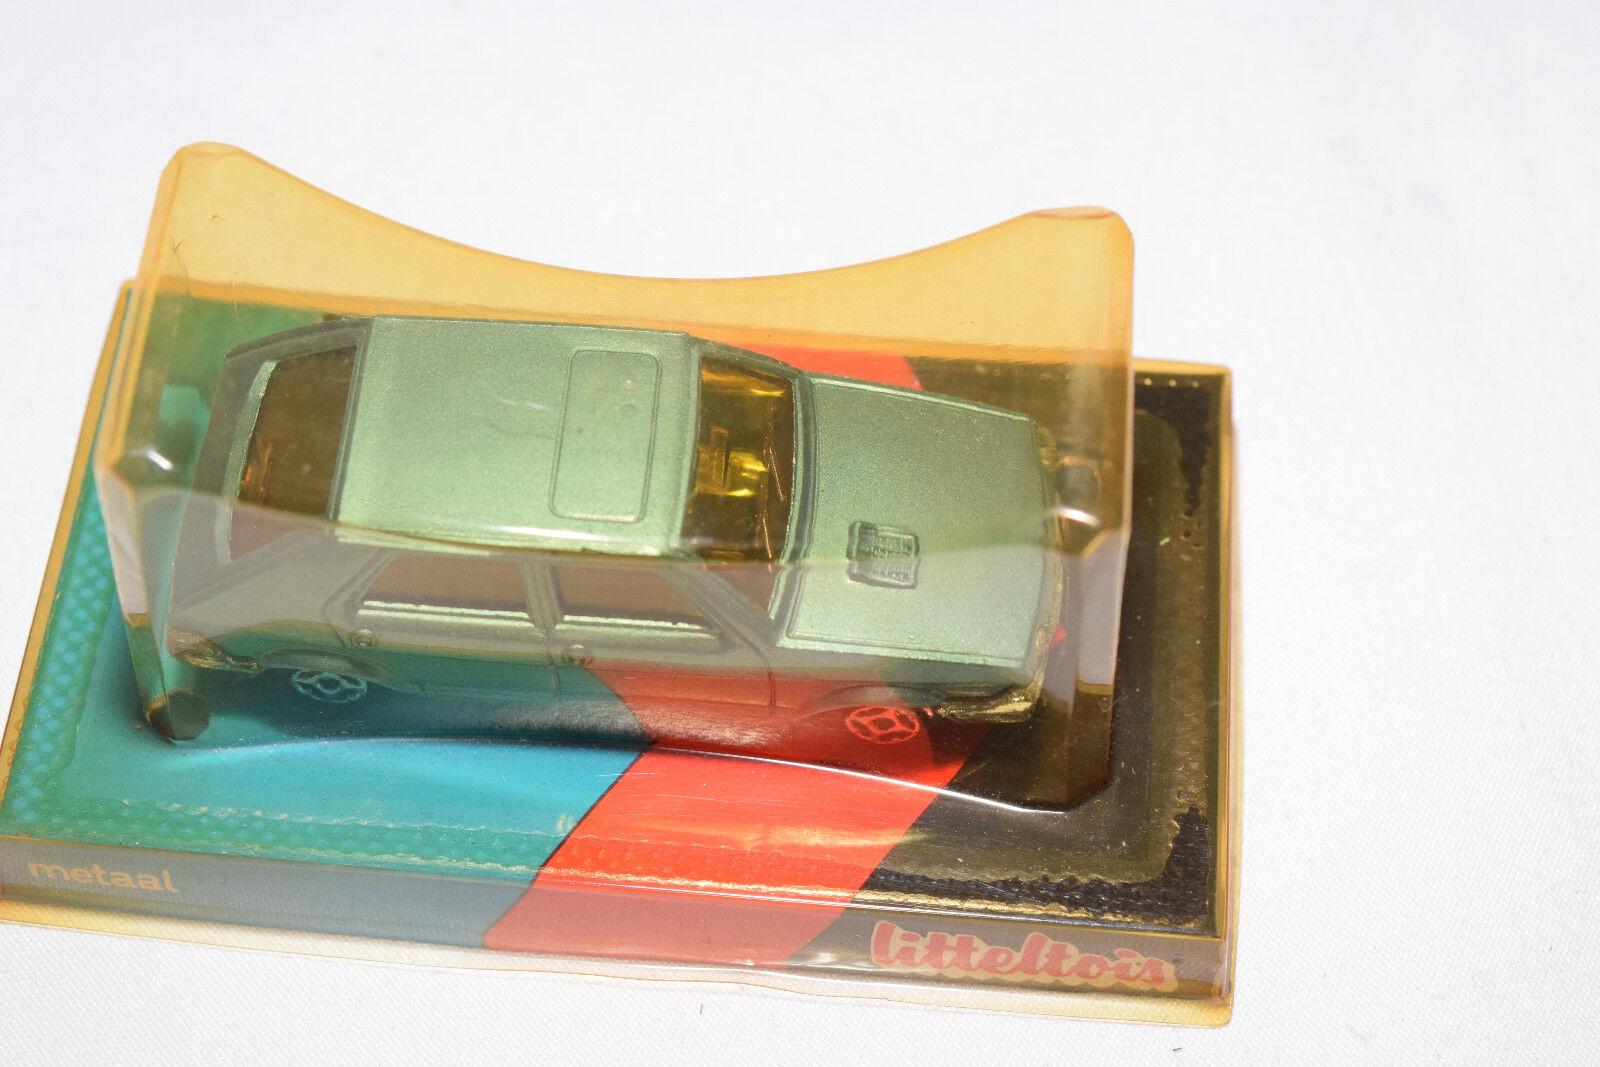 LITTELTOIS 432 NOREV FIAT RITMO RITMO RITMO METALLIC LIGHT blueE MINT BOXED RARE SELTEN RARO 60c21a